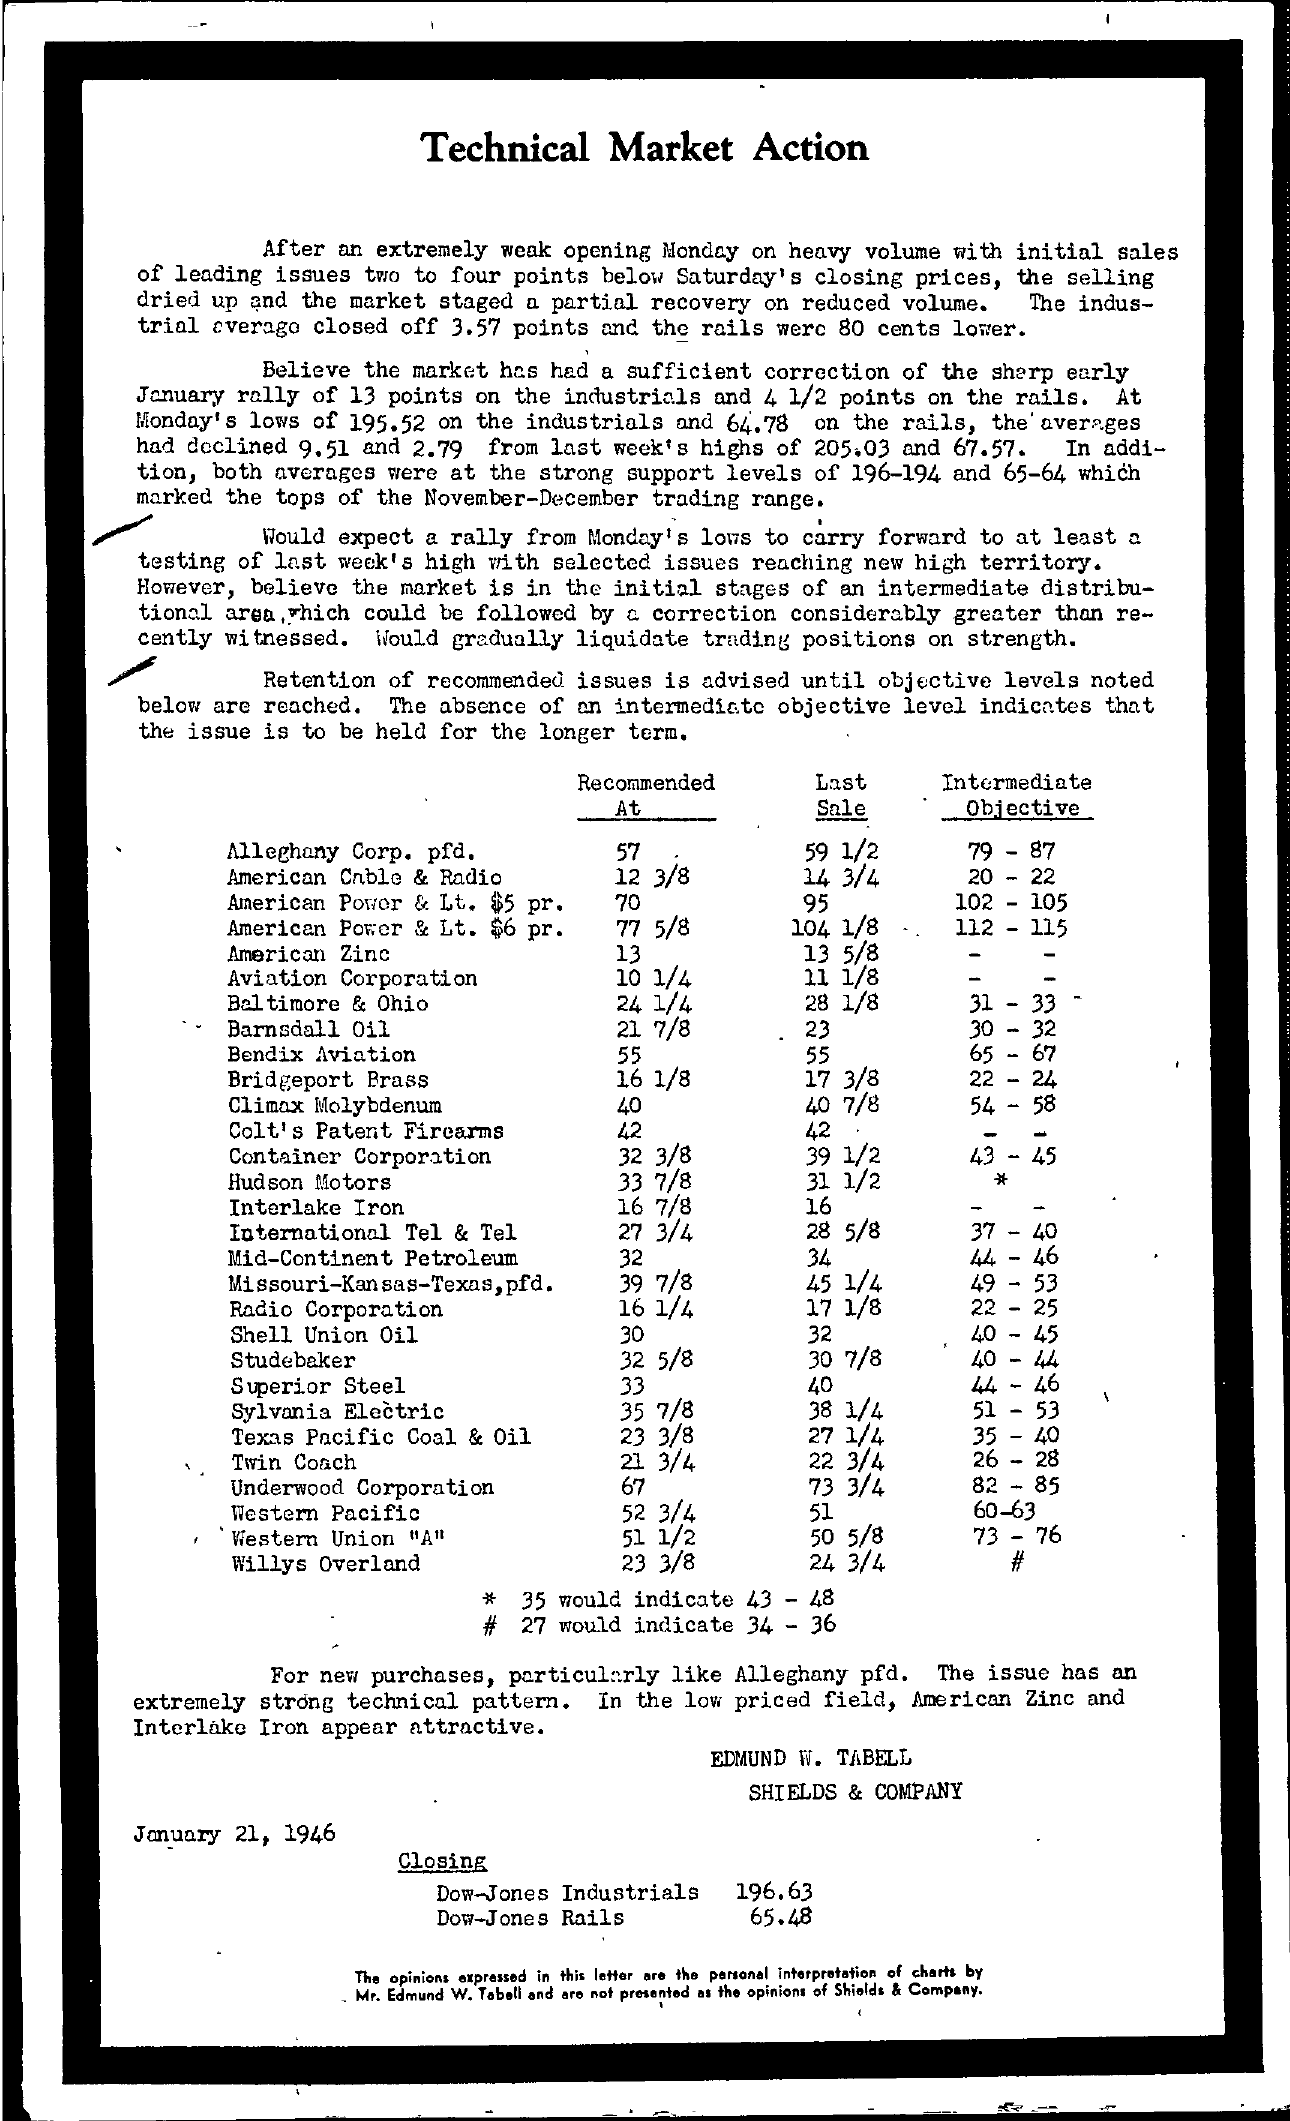 Tabell's Market Letter - January 21, 1946